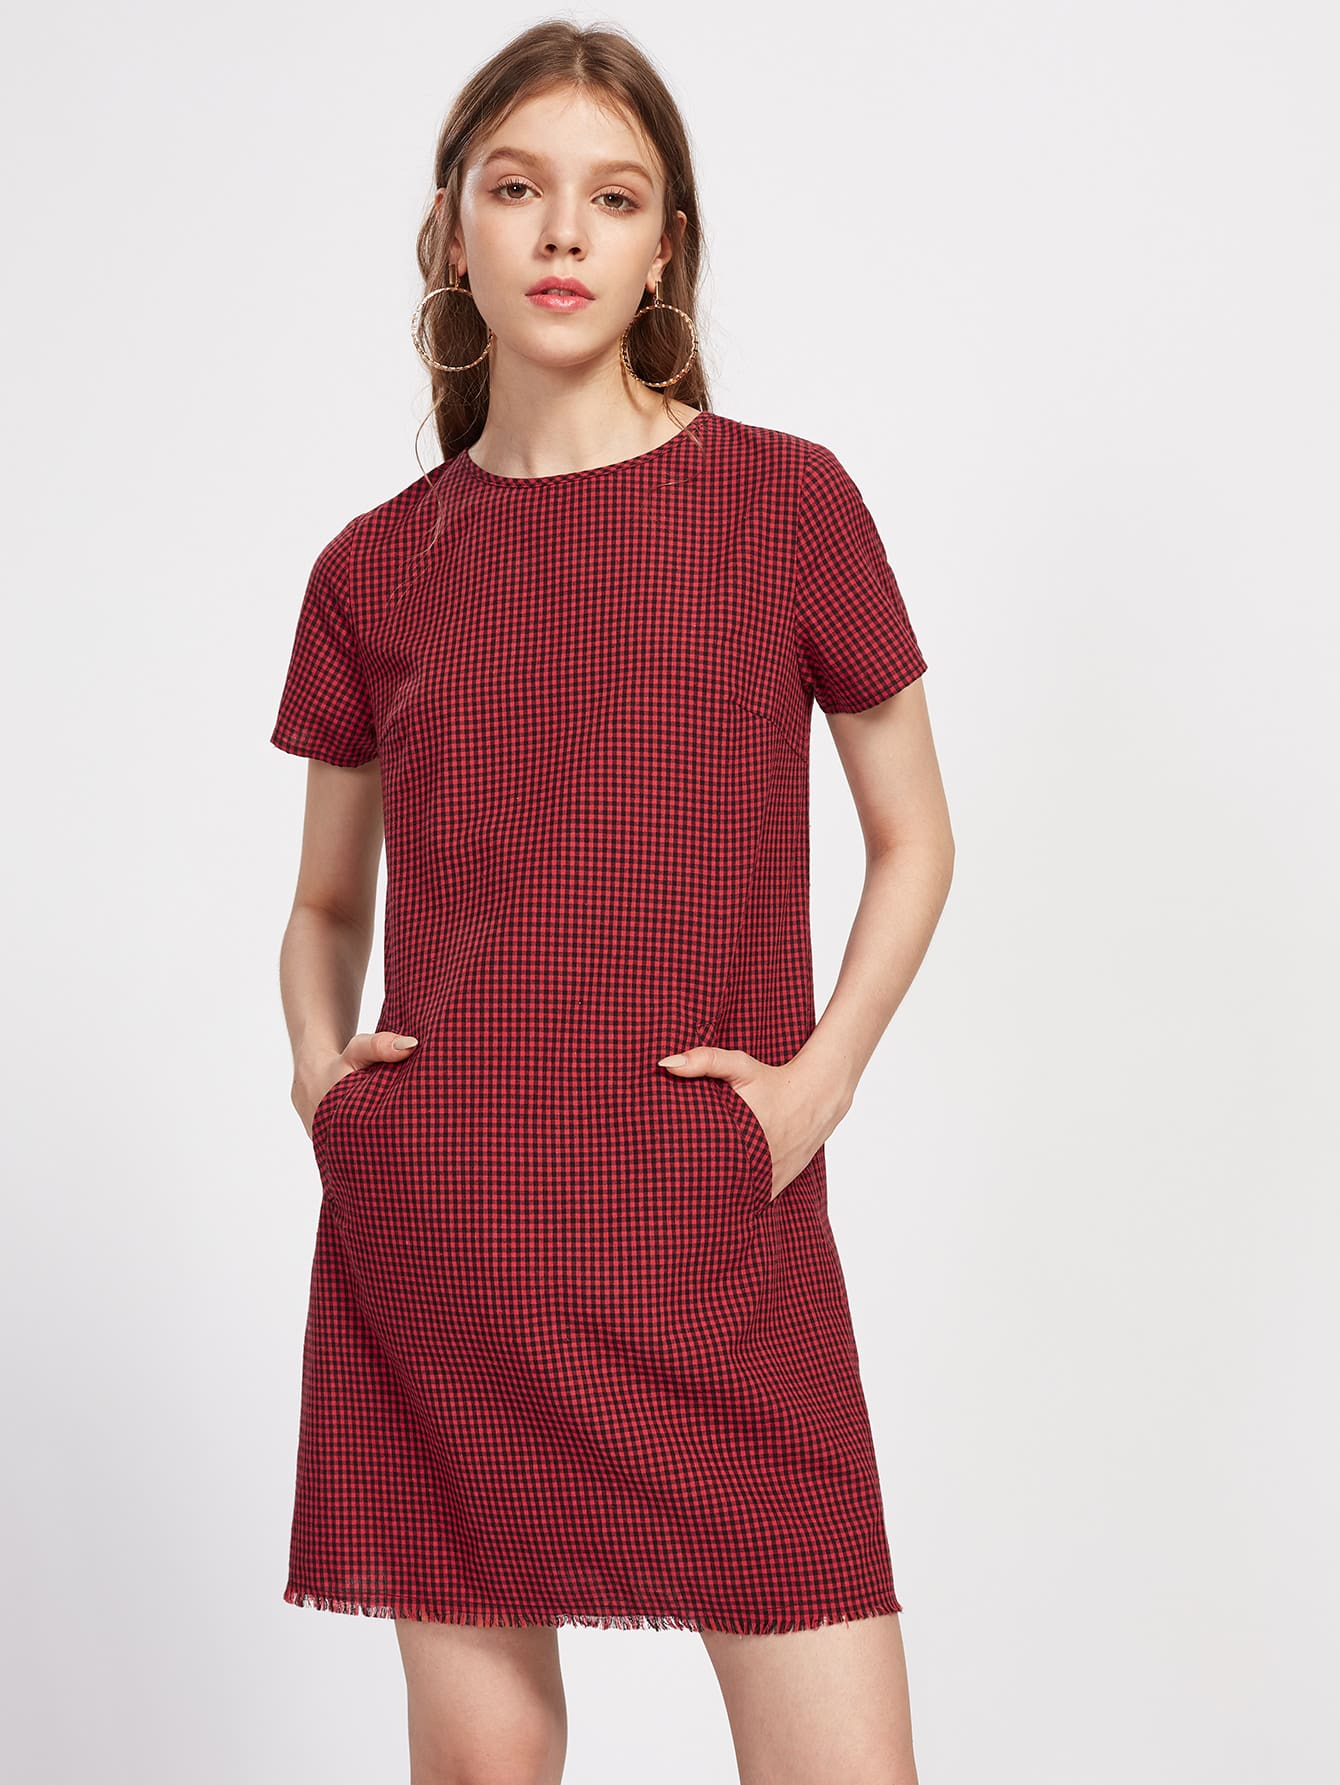 Pocket Front Frayed Hem Checkered Dress